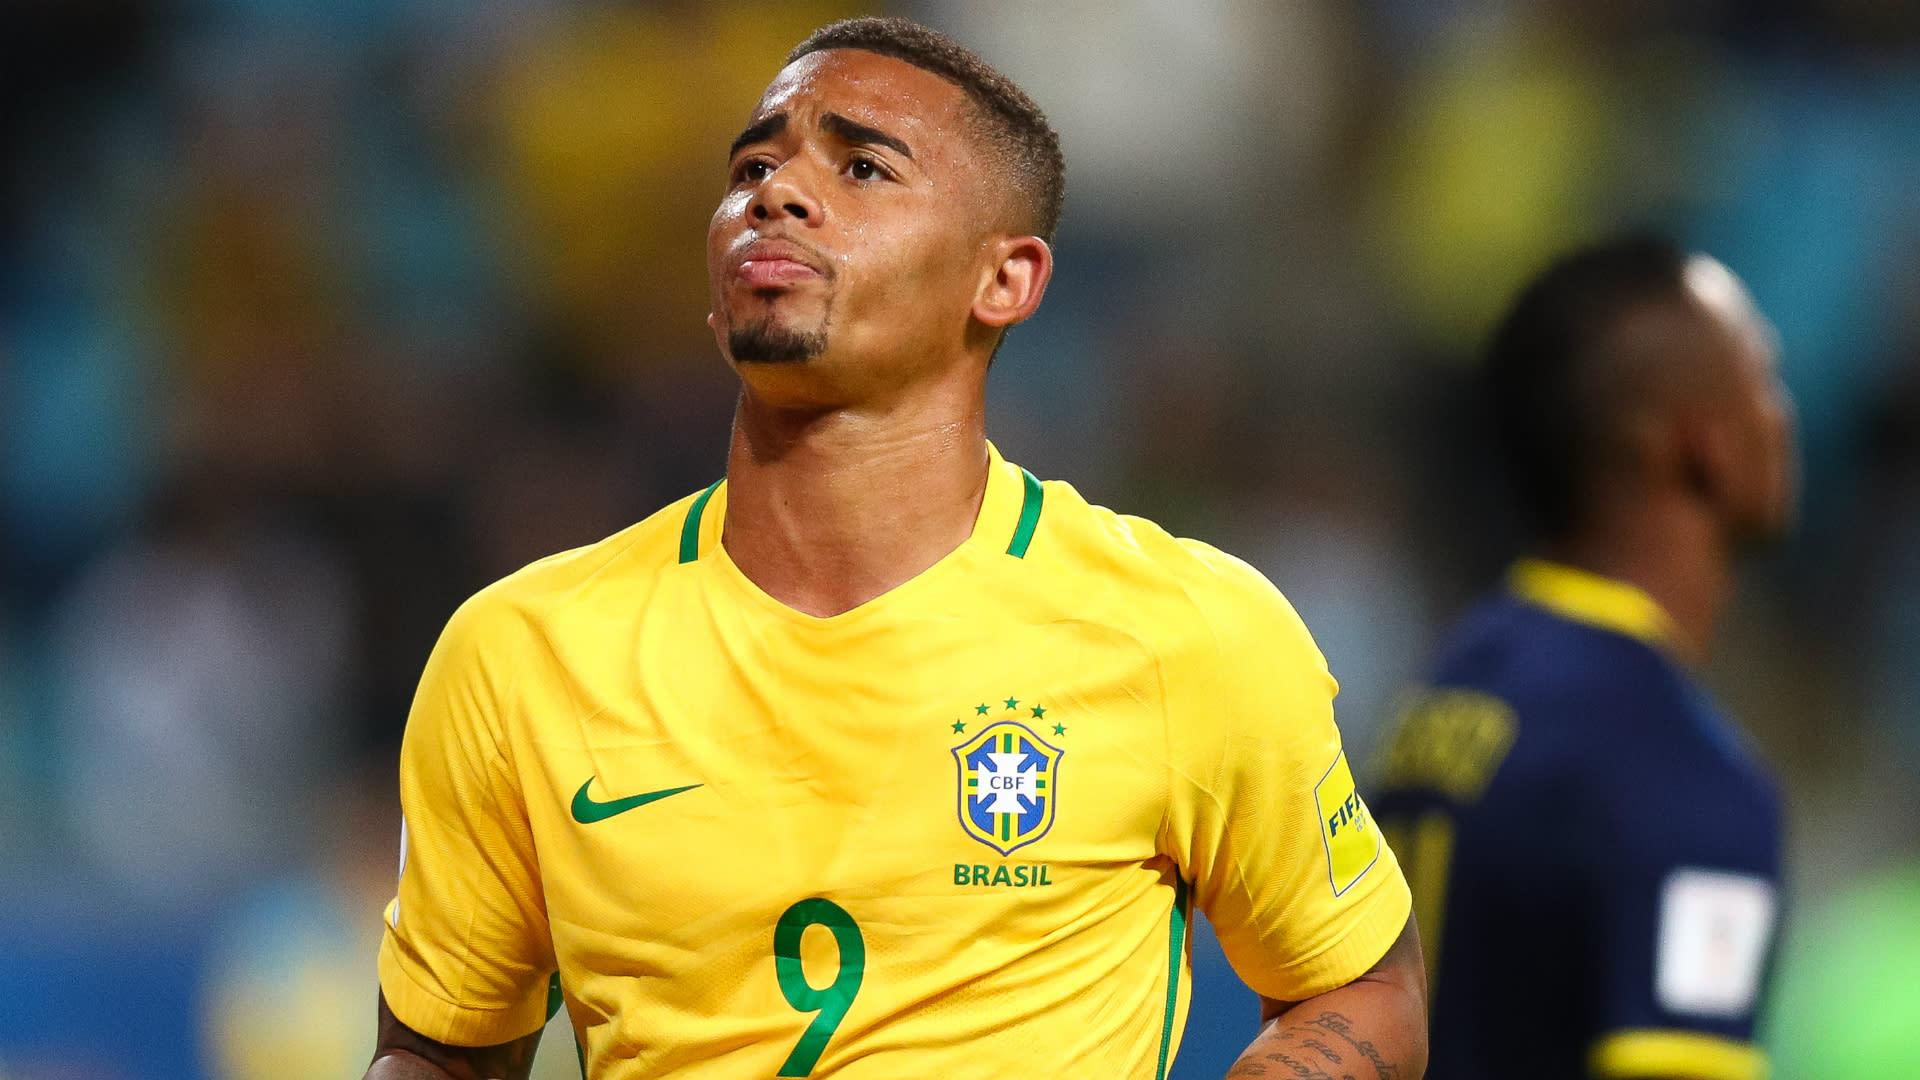 Бразилия, Аргентина и Колумбия. Лучшие прогнозы на Кубок Америки